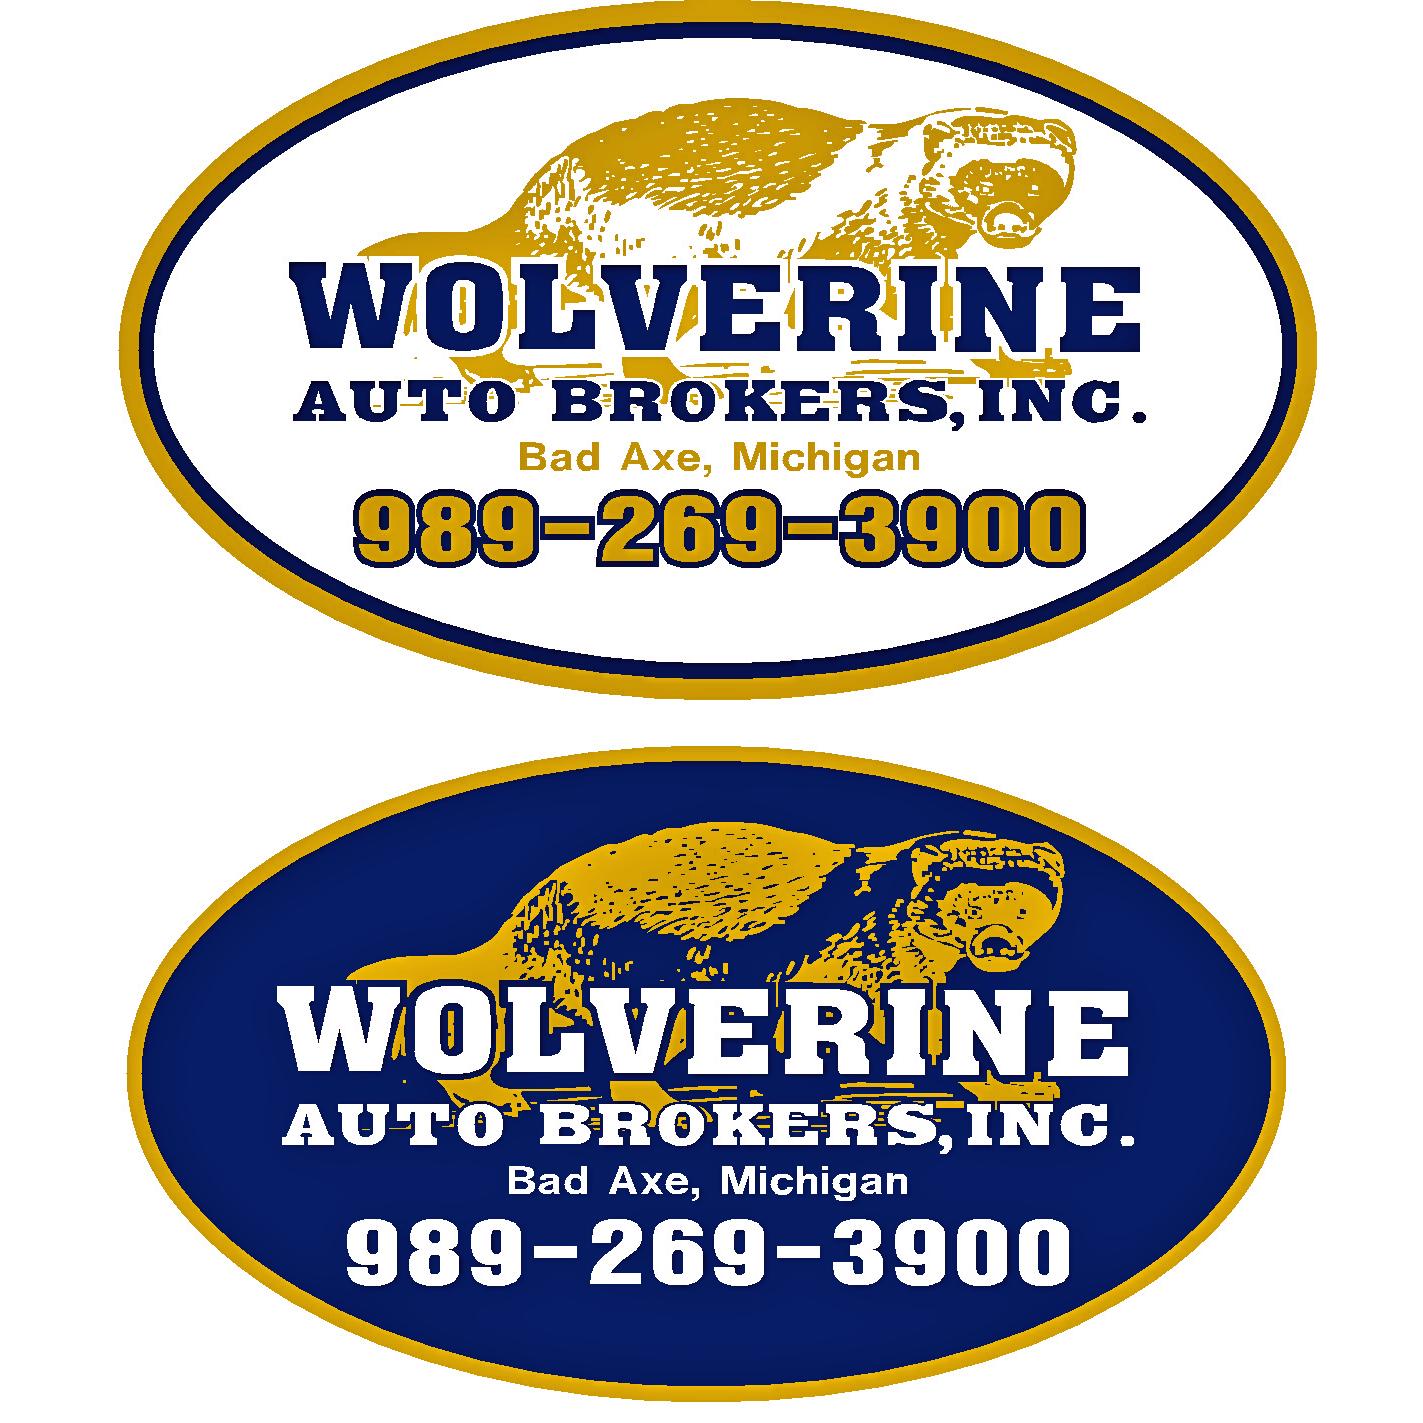 Wolverine Auto Brokers